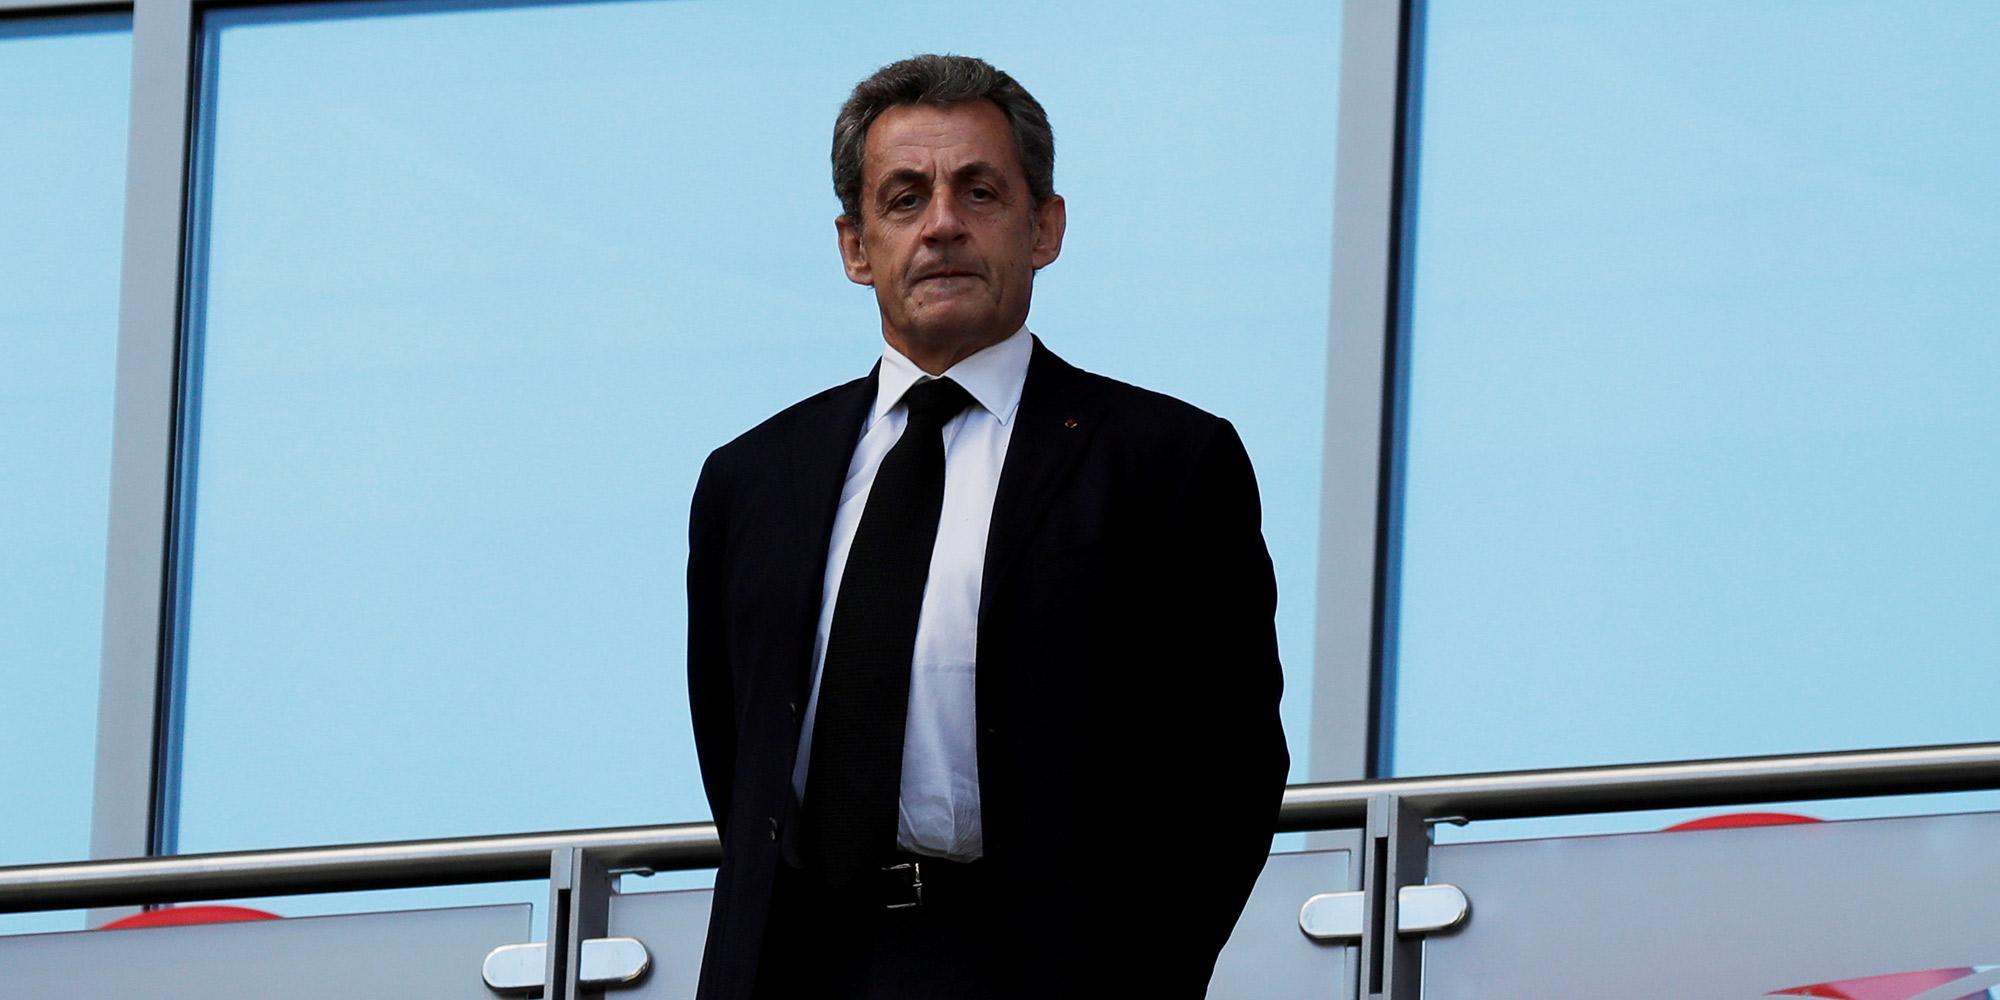 Quand Nicolas Sarkozy Dedicace Son Livre A Delphine Ernotte